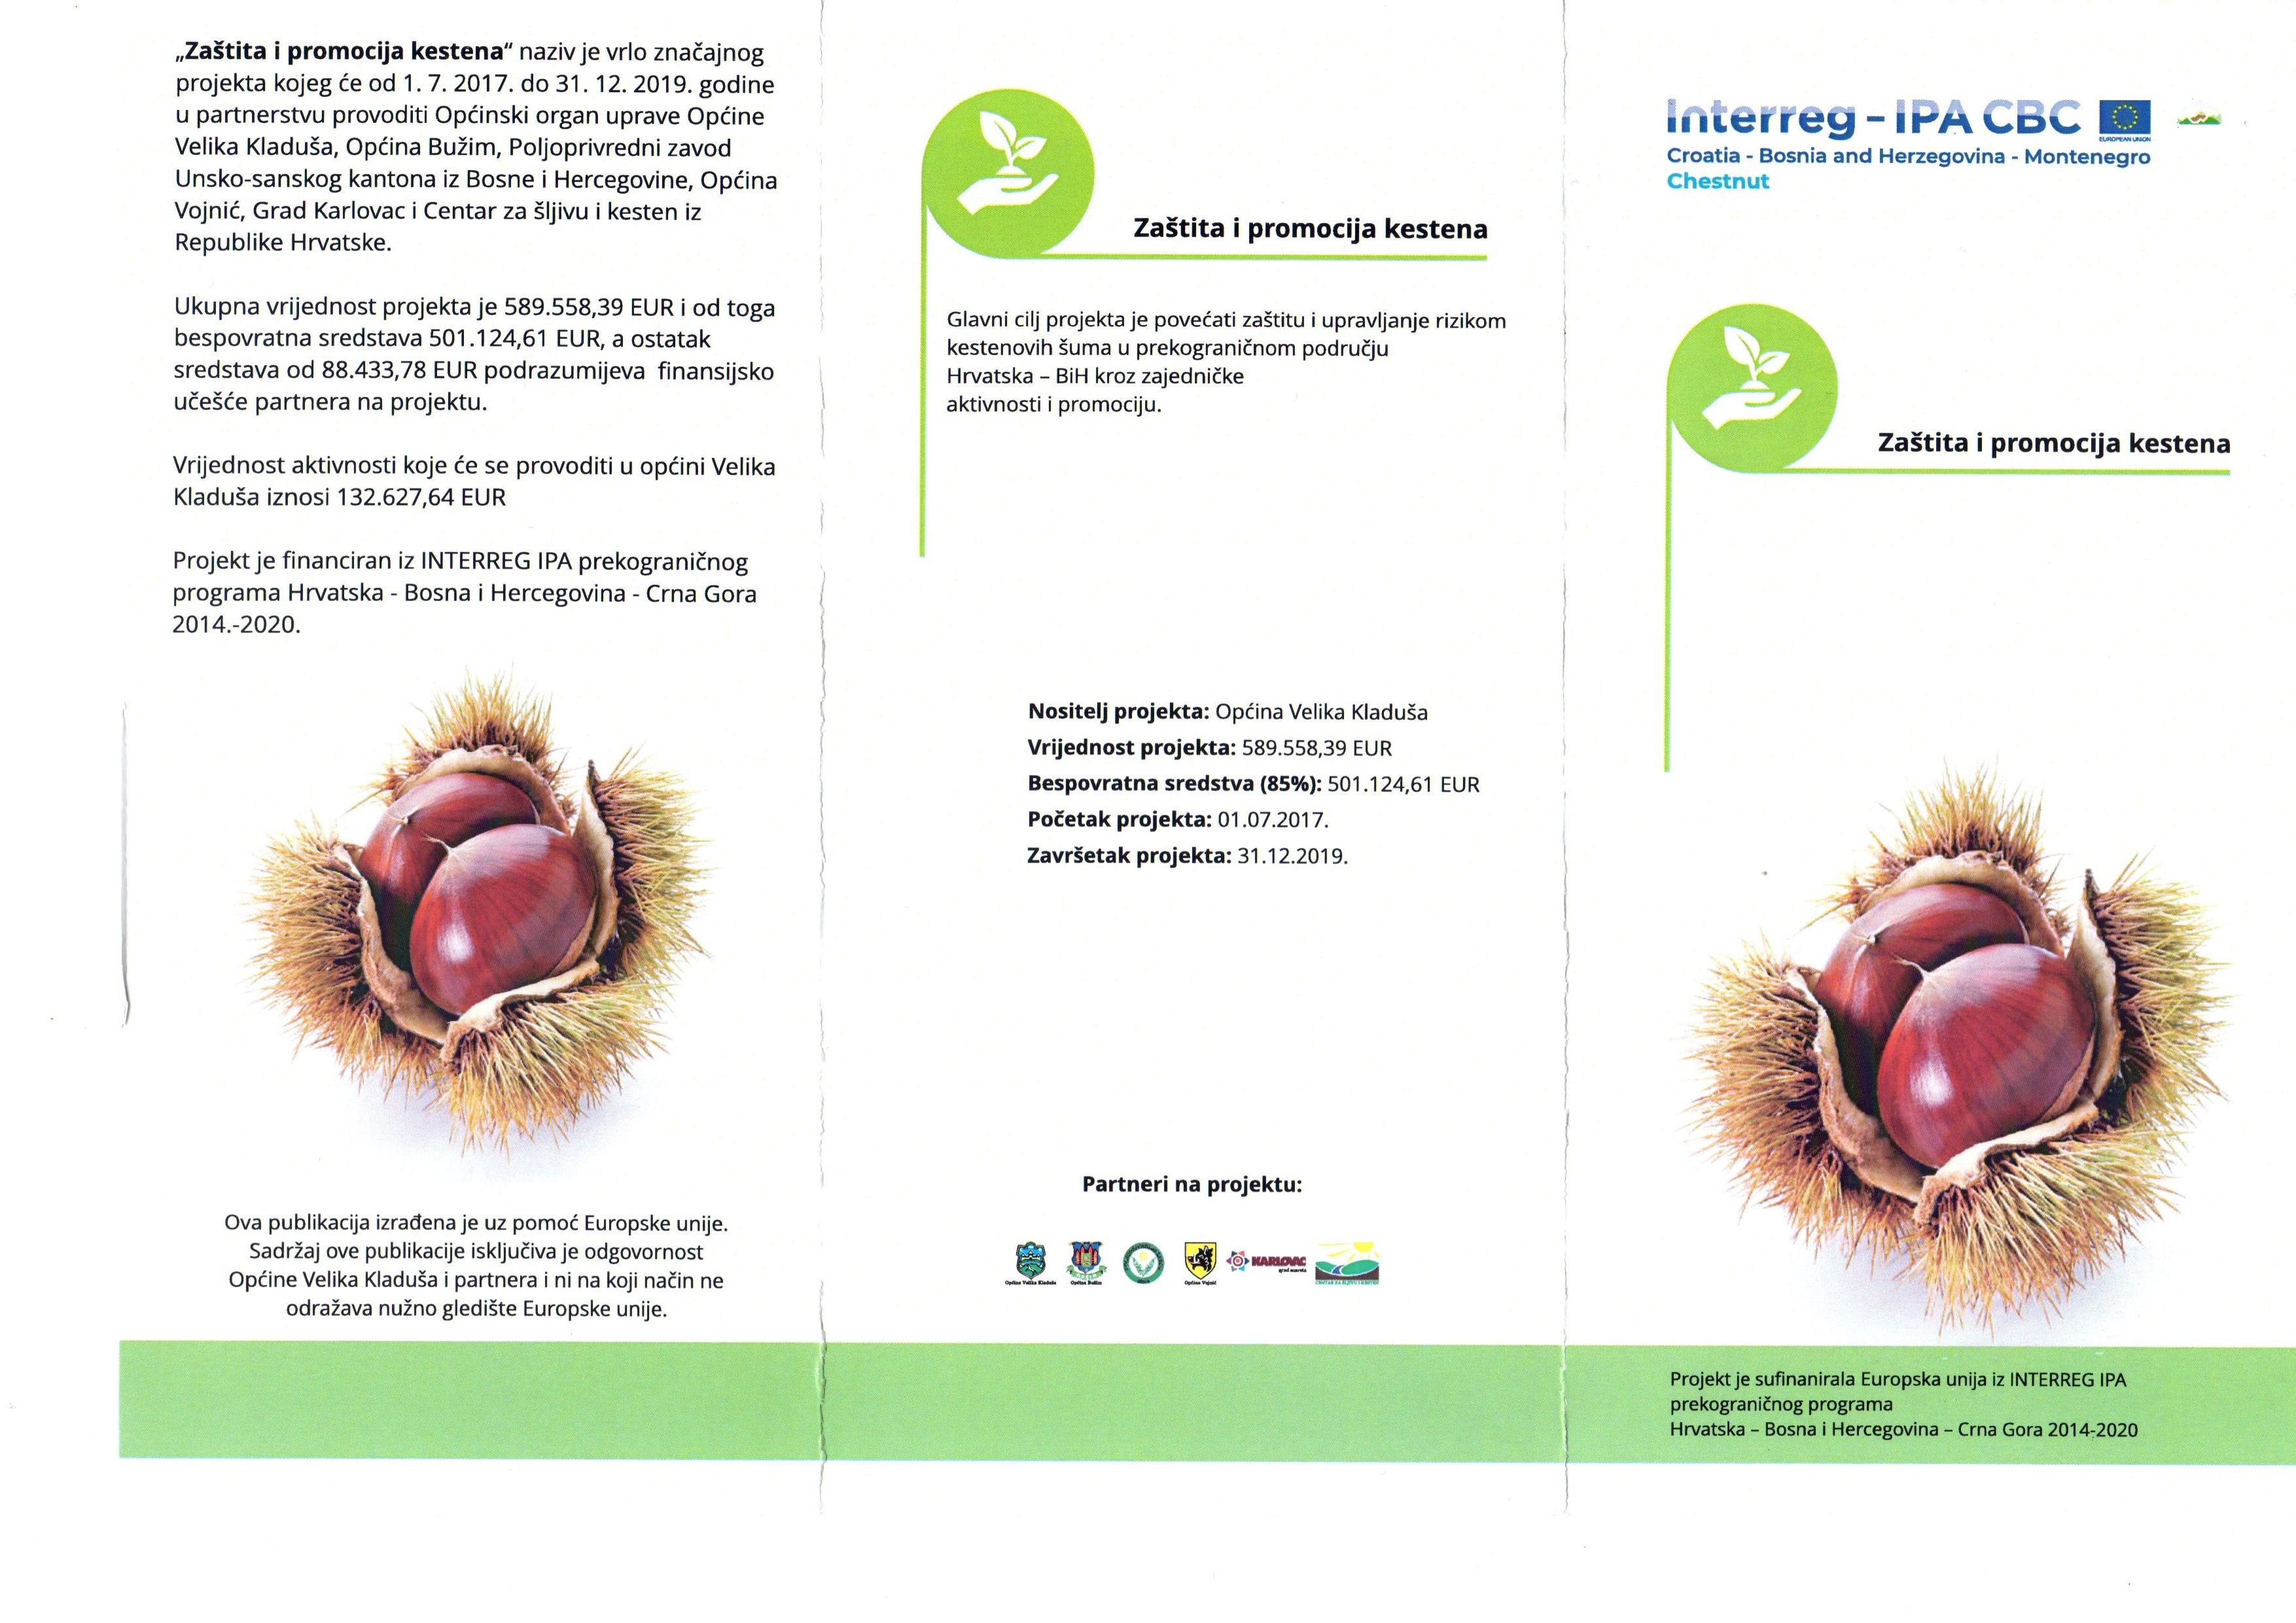 Studije održivih ekoloških i gospodarskih potencijala kestena